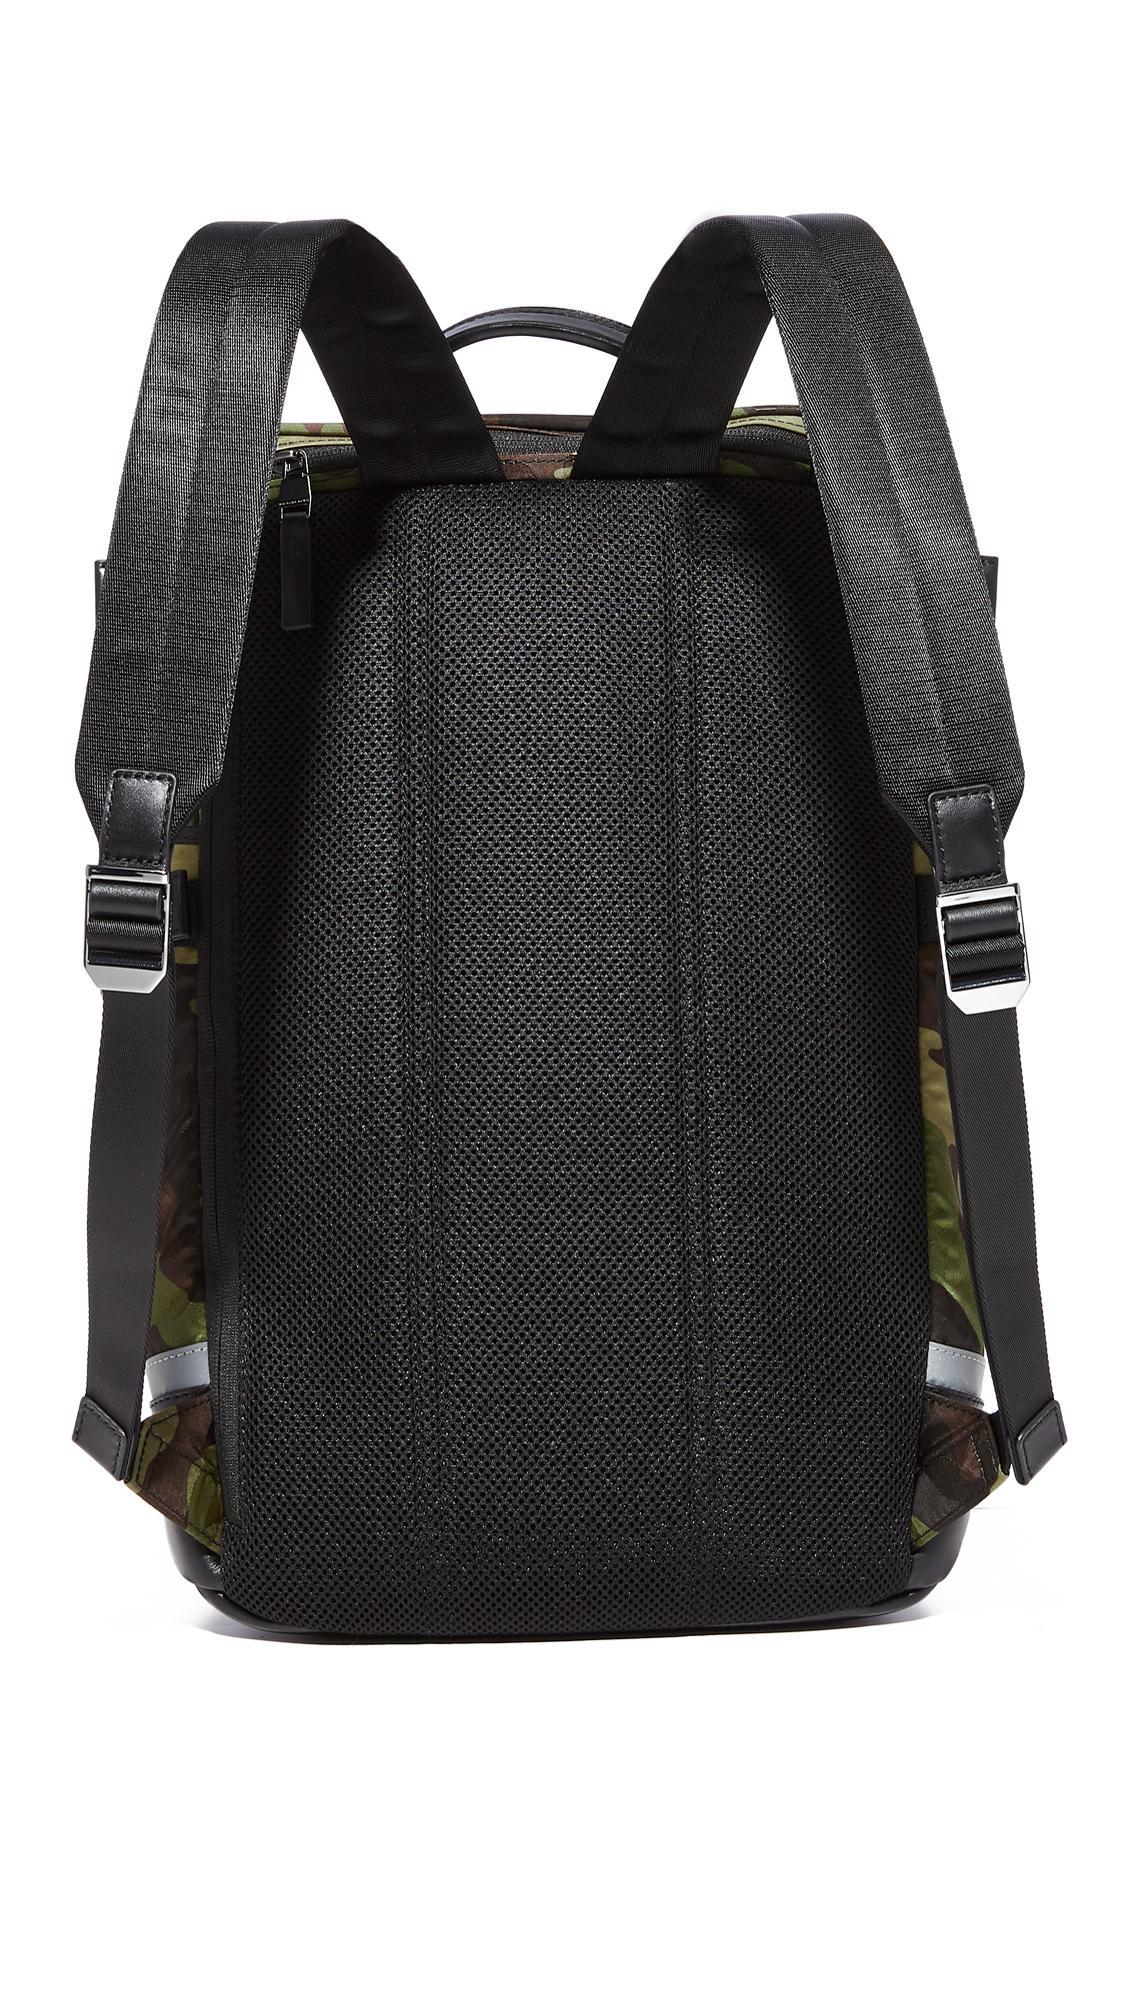 93beb31dbad7 Michael Kors Kent Camo Nylon Cycling Backpack in Black for Men - Lyst